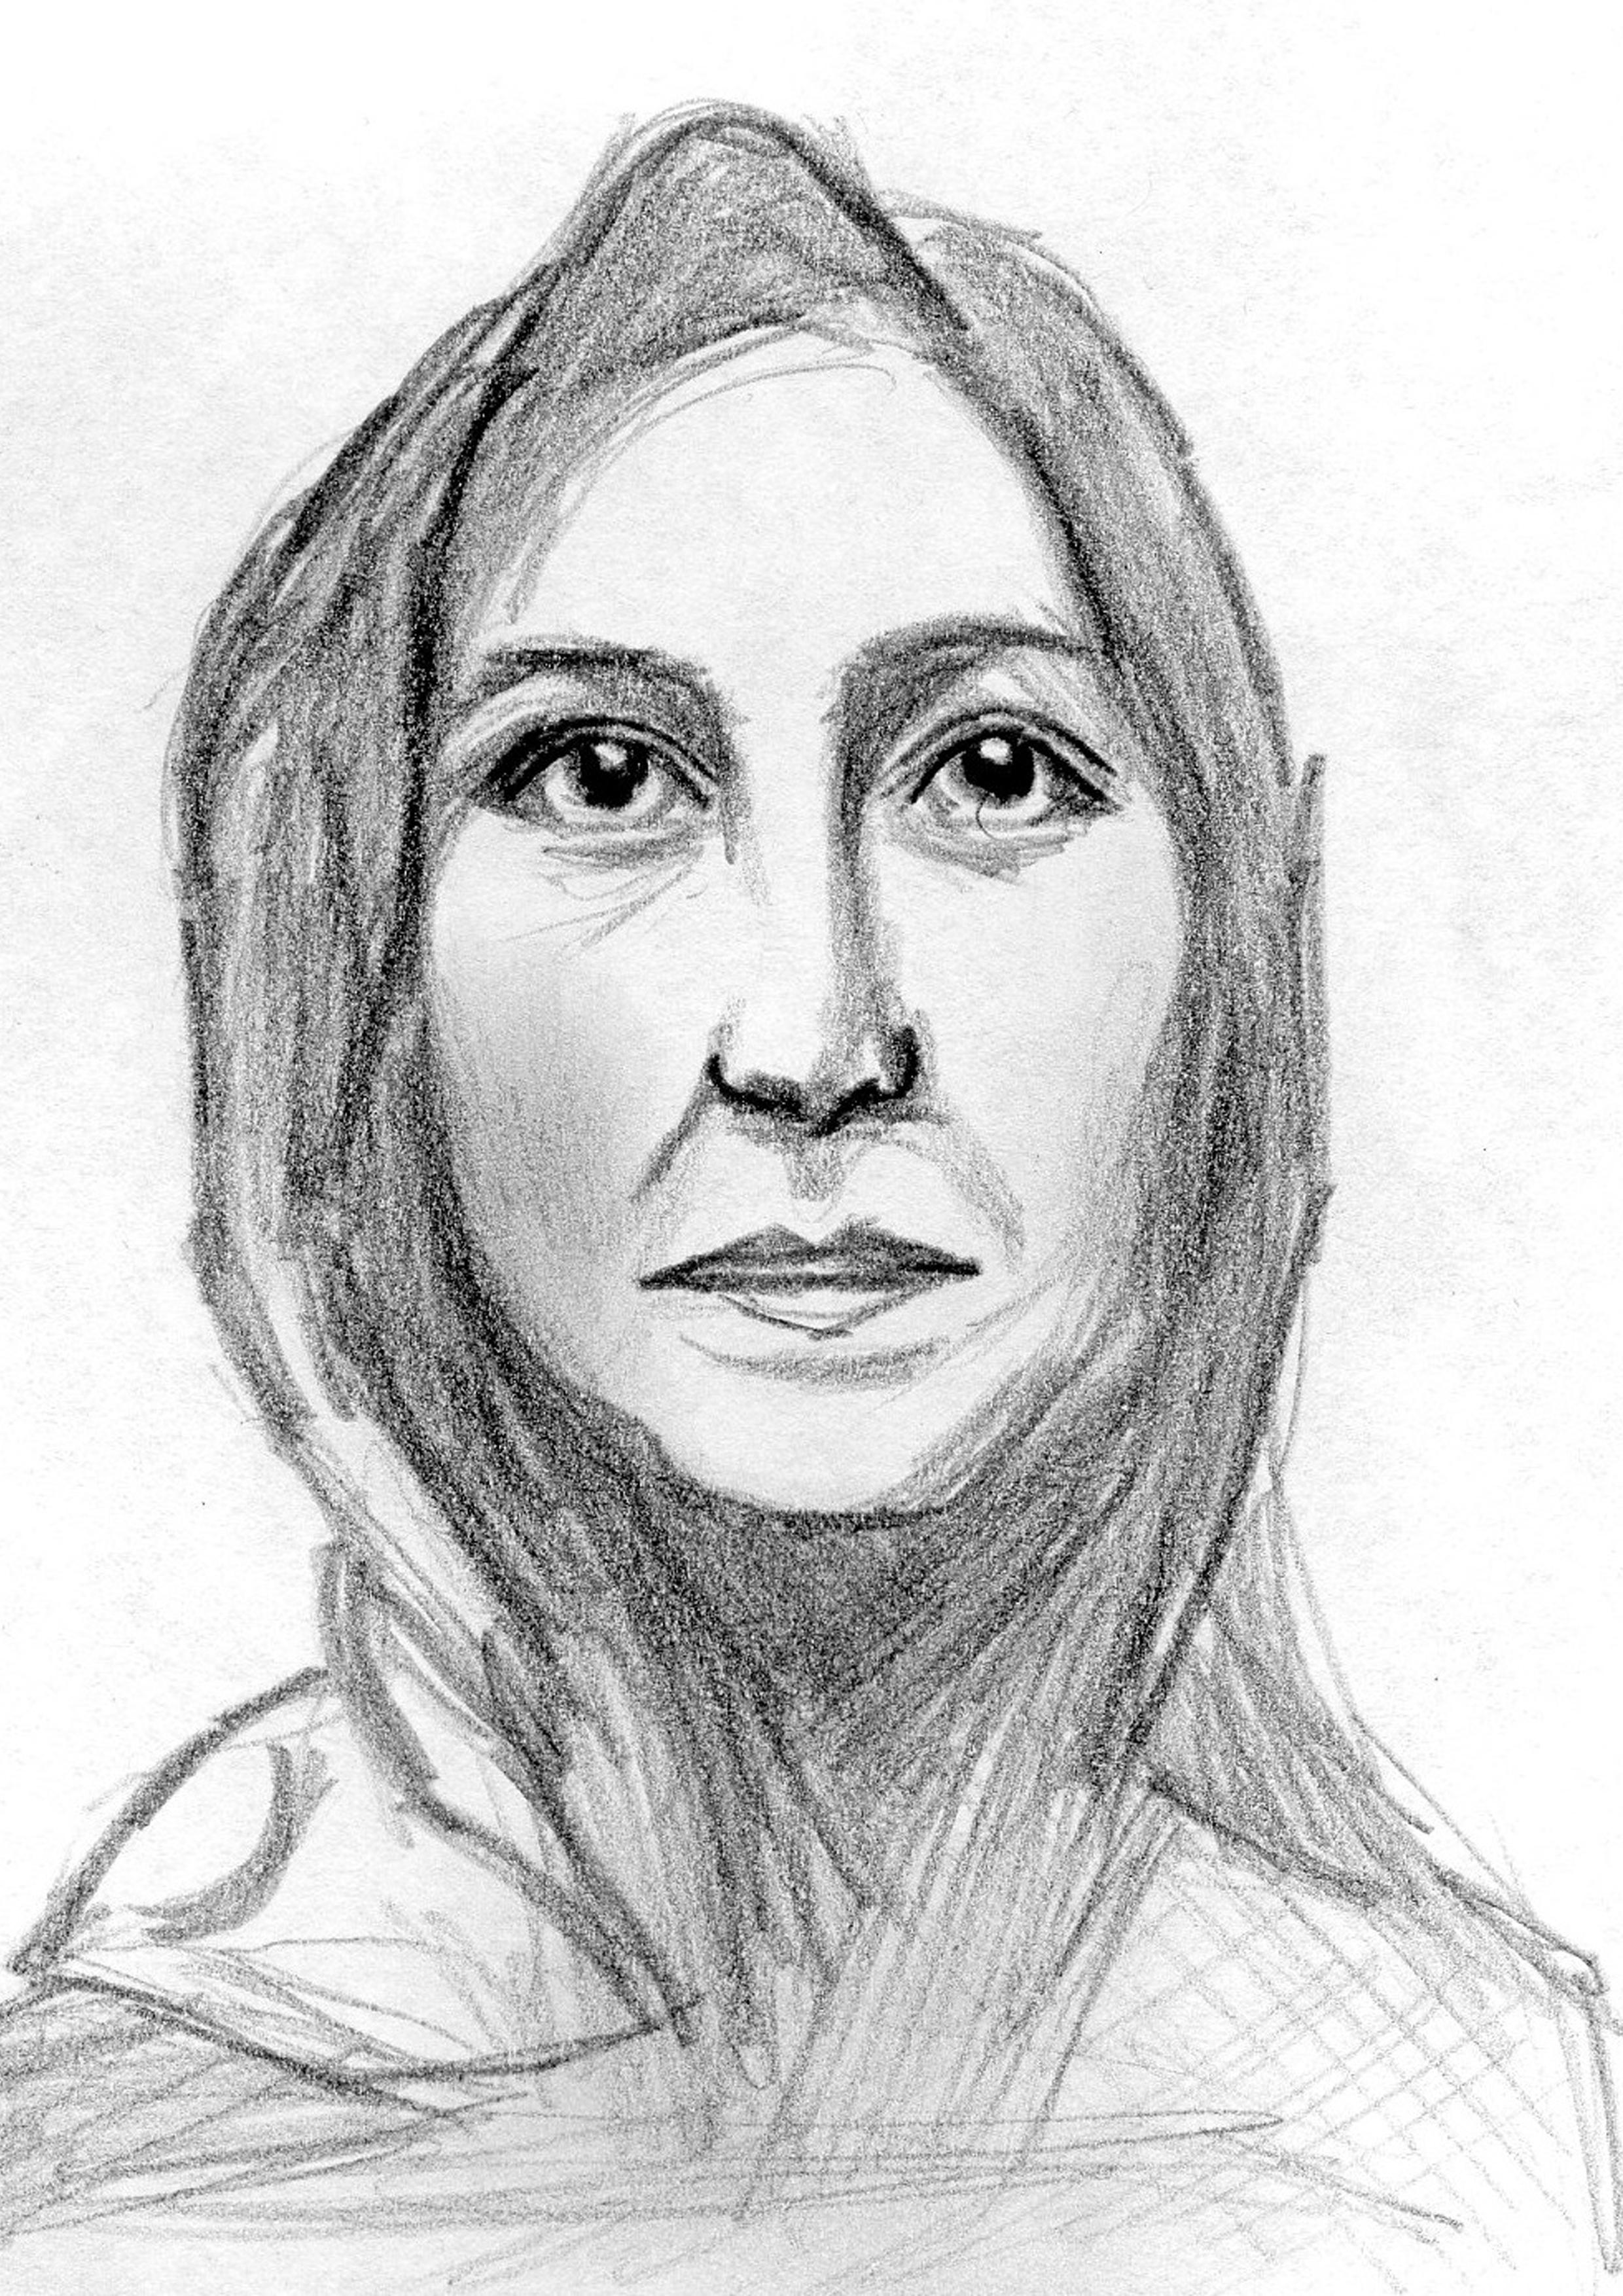 Malika (Zeichnung: Amanda Müller)